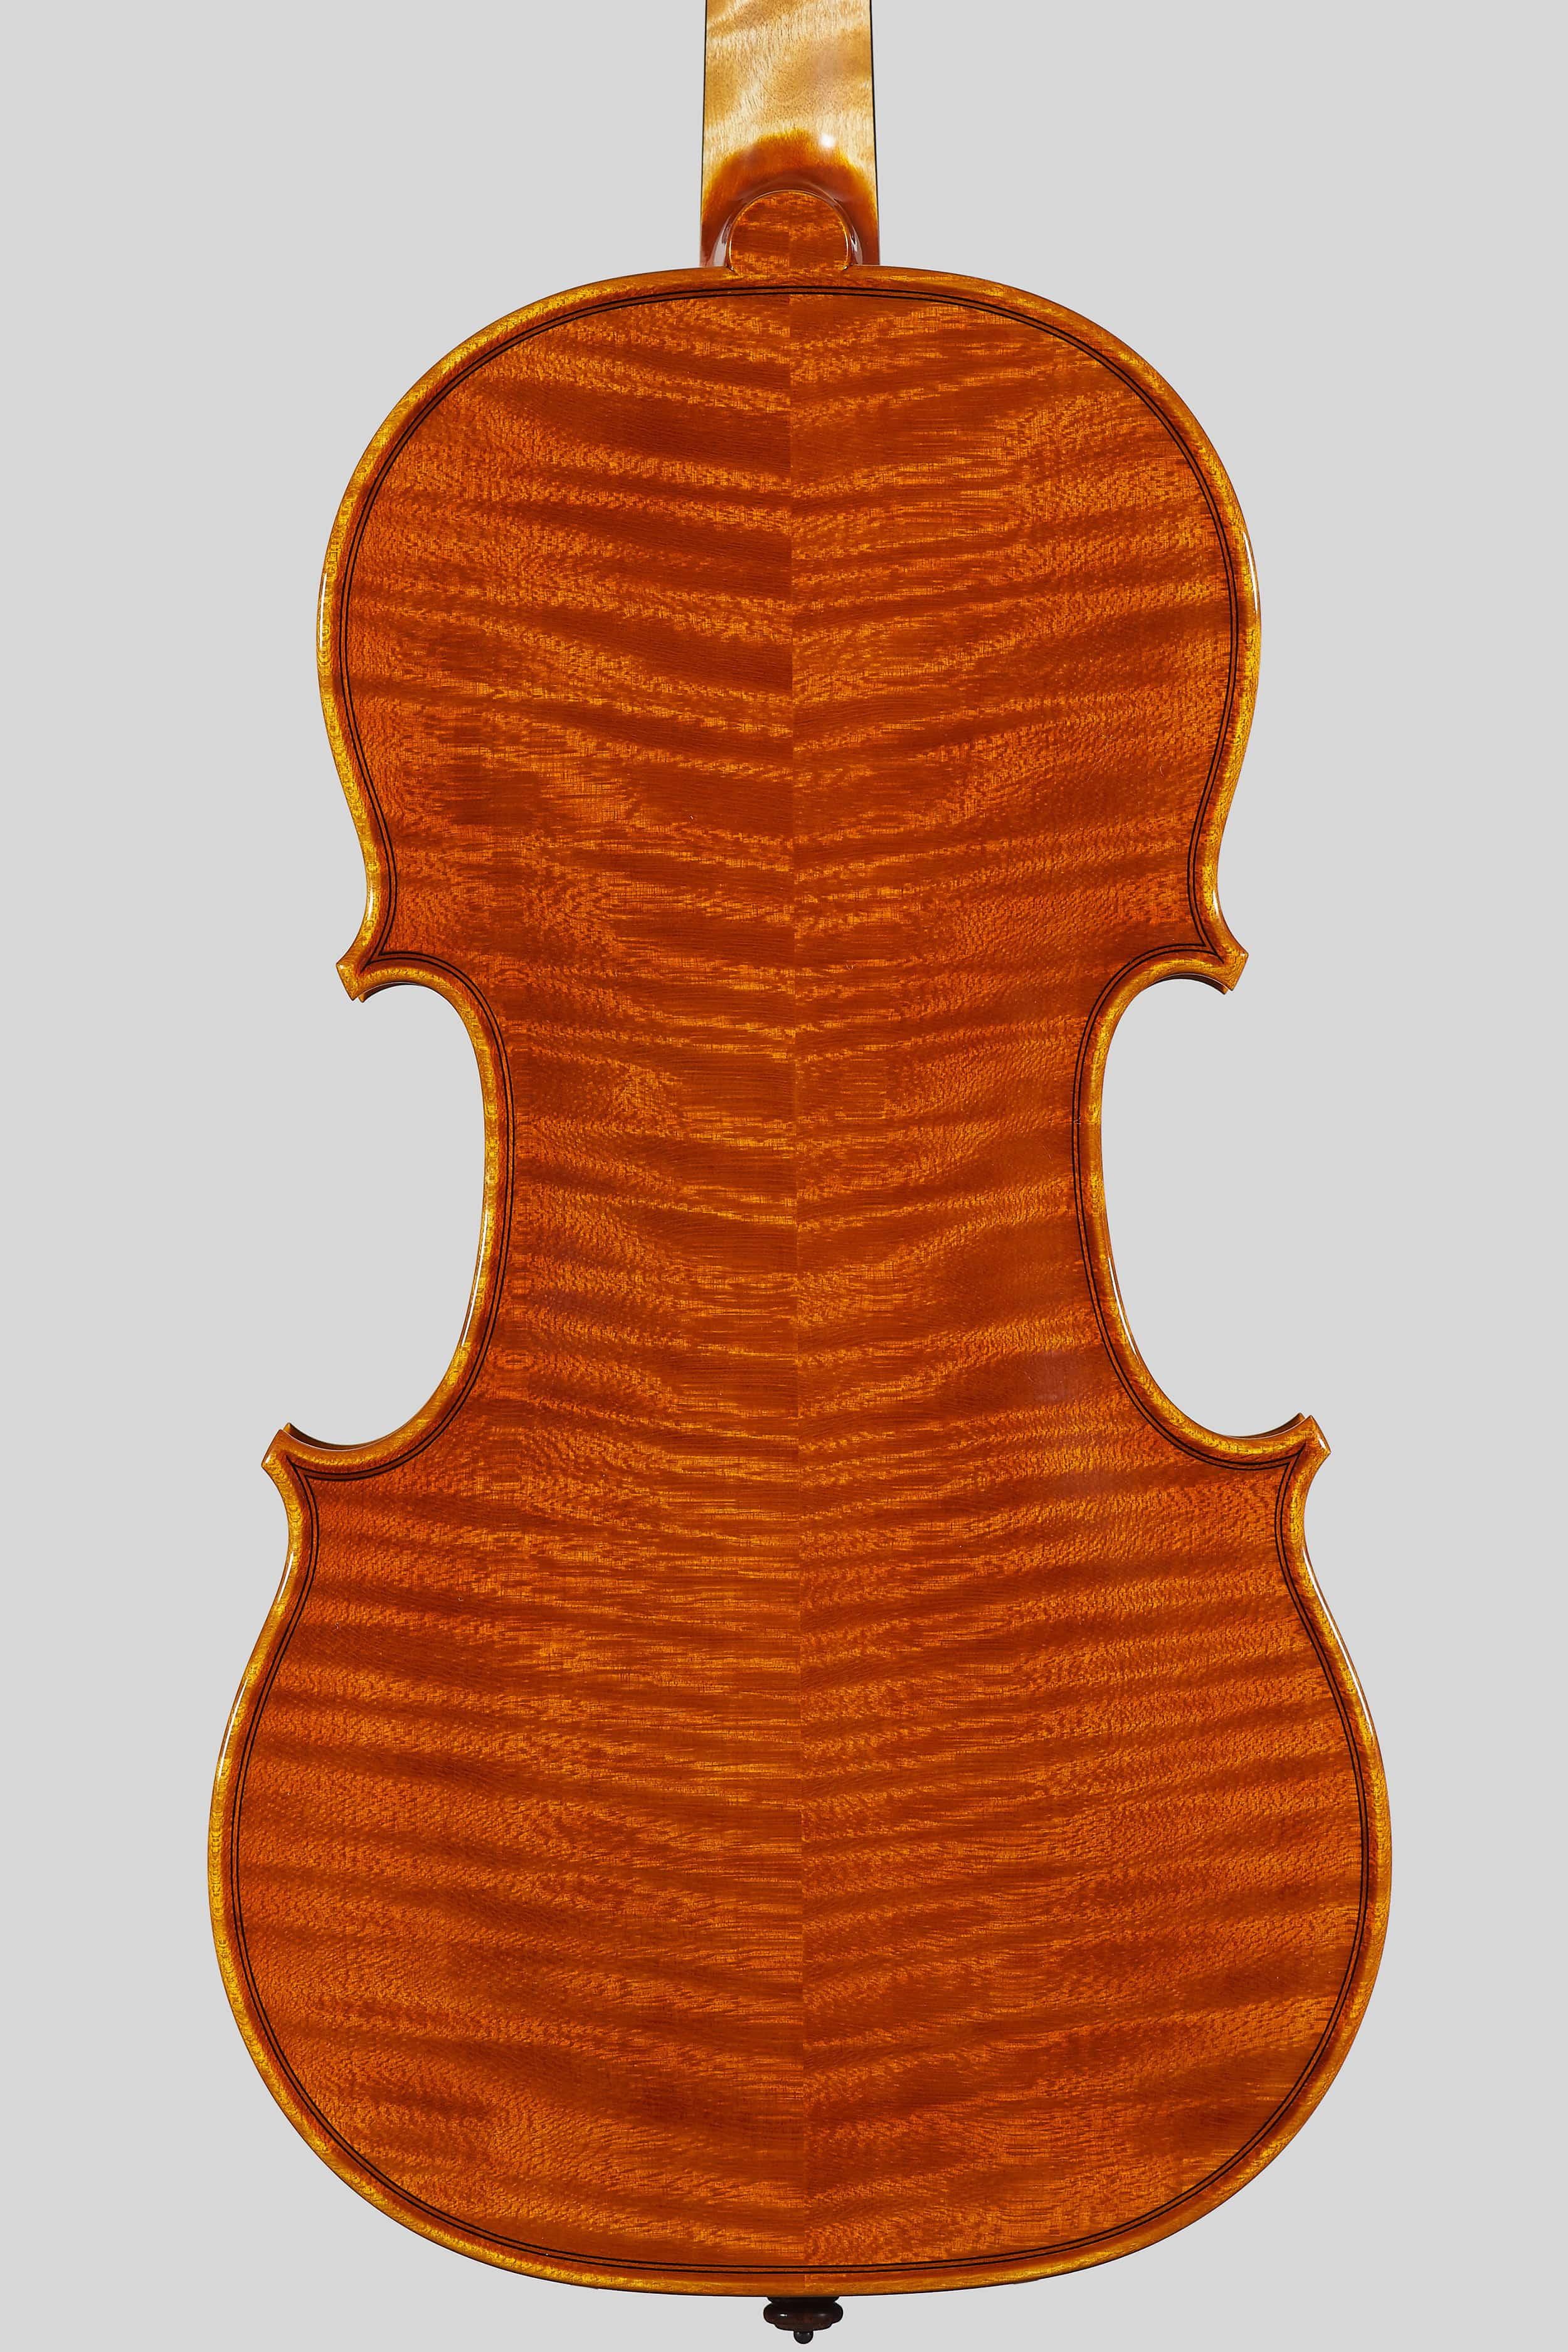 Anno 2016 violino modello a stradivari soil 1714 for Soil 1714 stradivarius